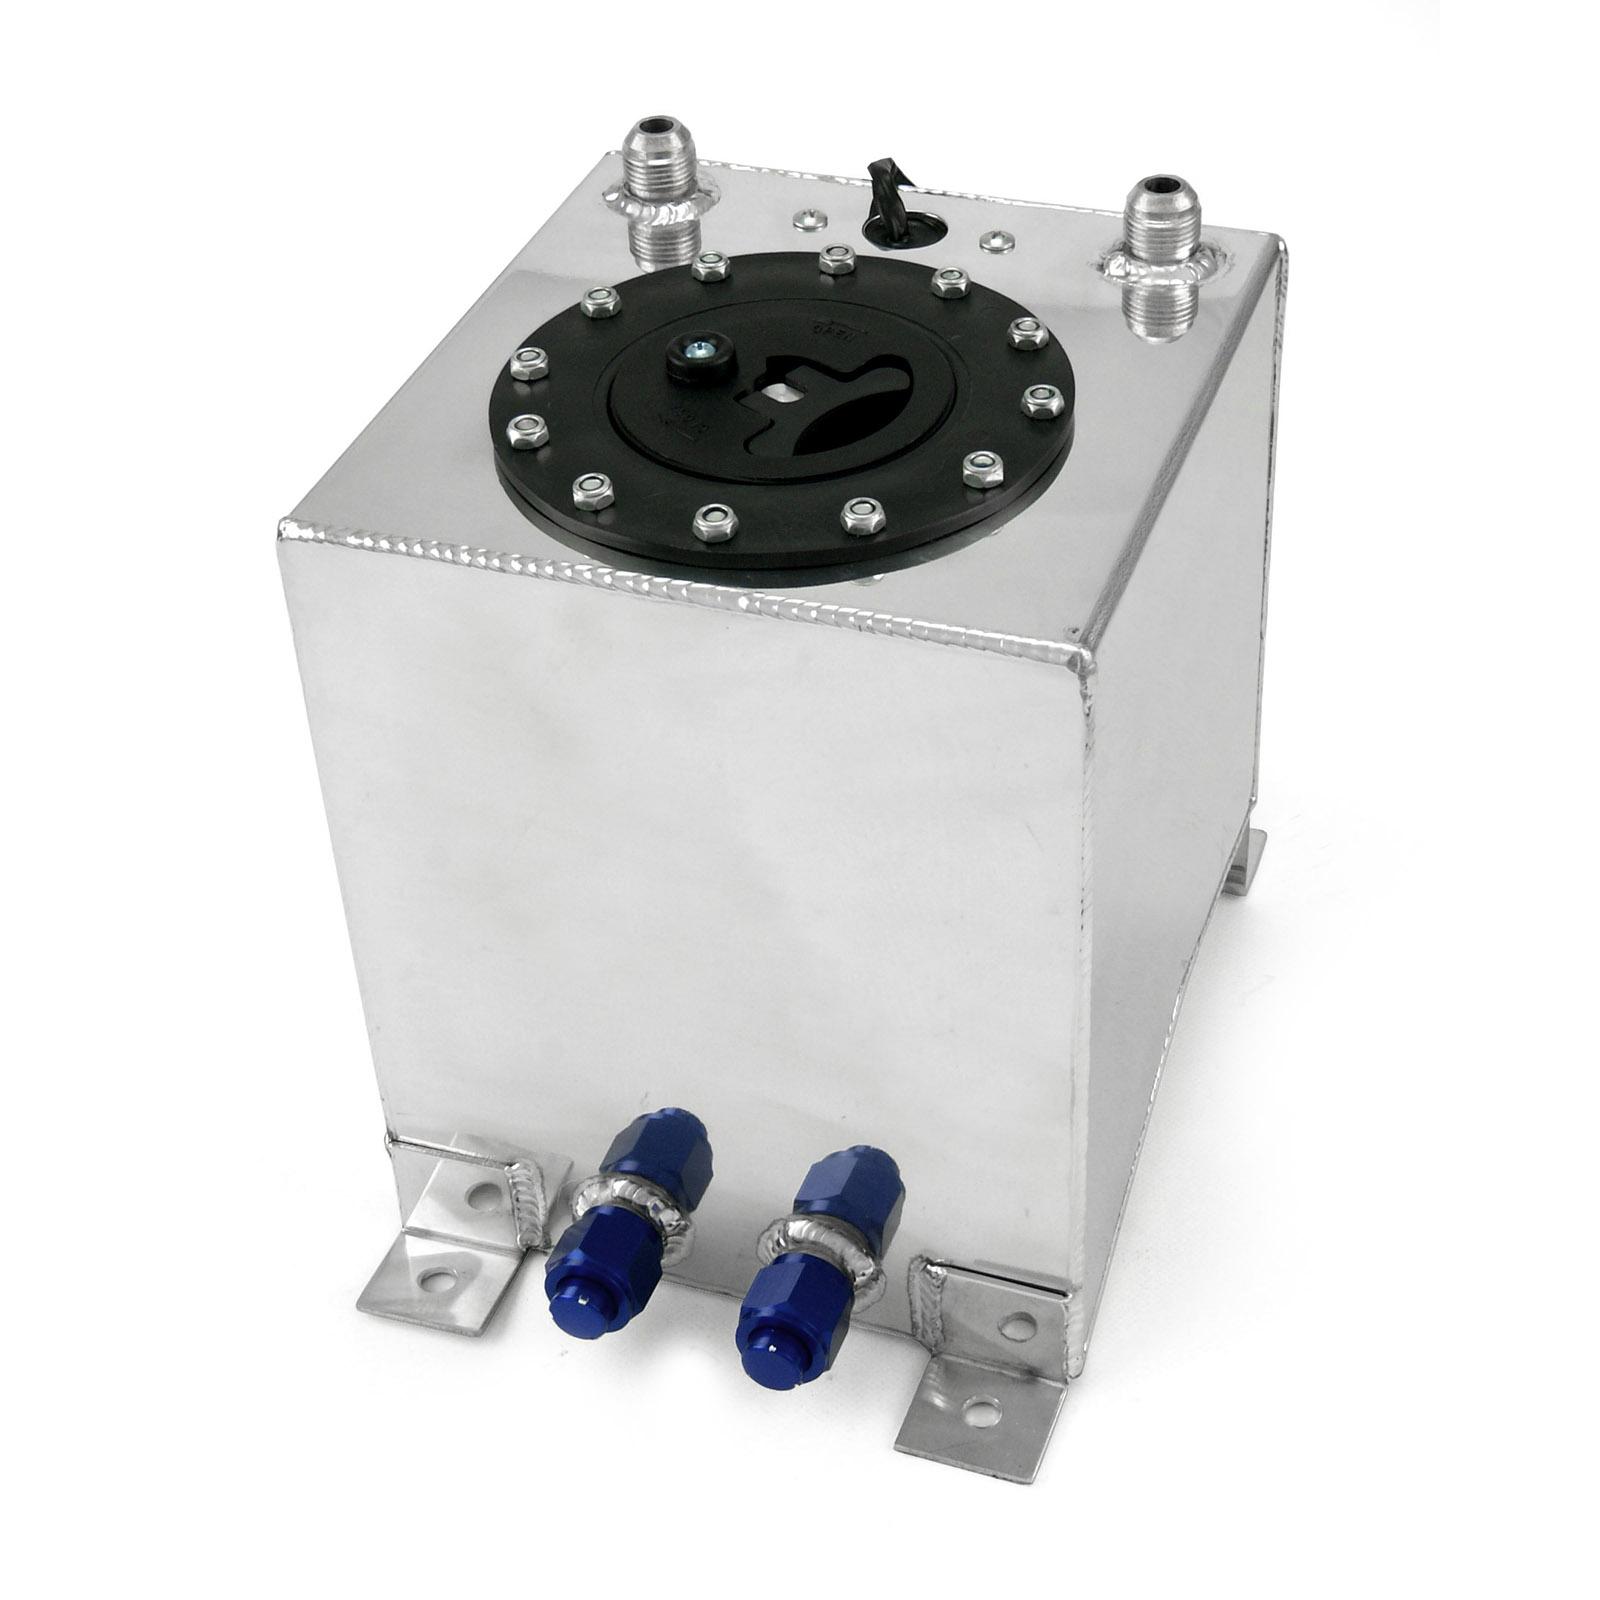 3 gallon fuel cell for sale 3 free engine image for user manual download. Black Bedroom Furniture Sets. Home Design Ideas